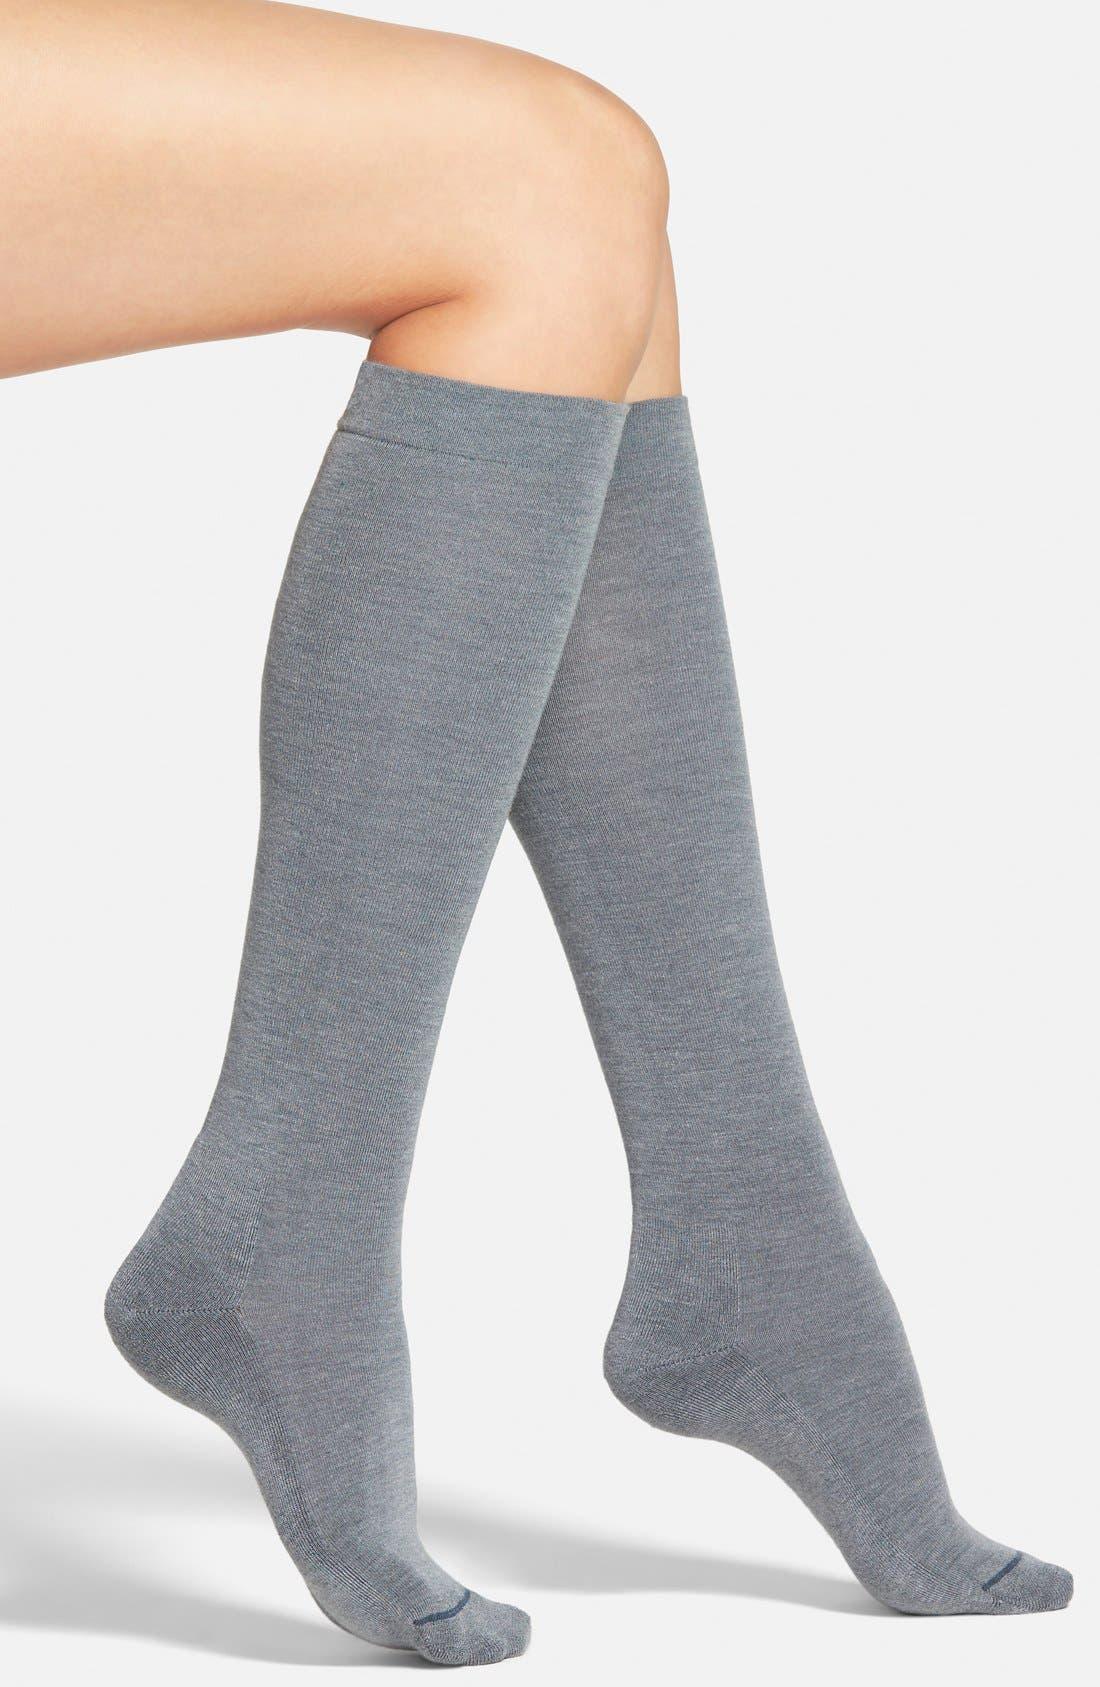 Main Image - Hue 'Heat Temp' Warming Knee High Socks